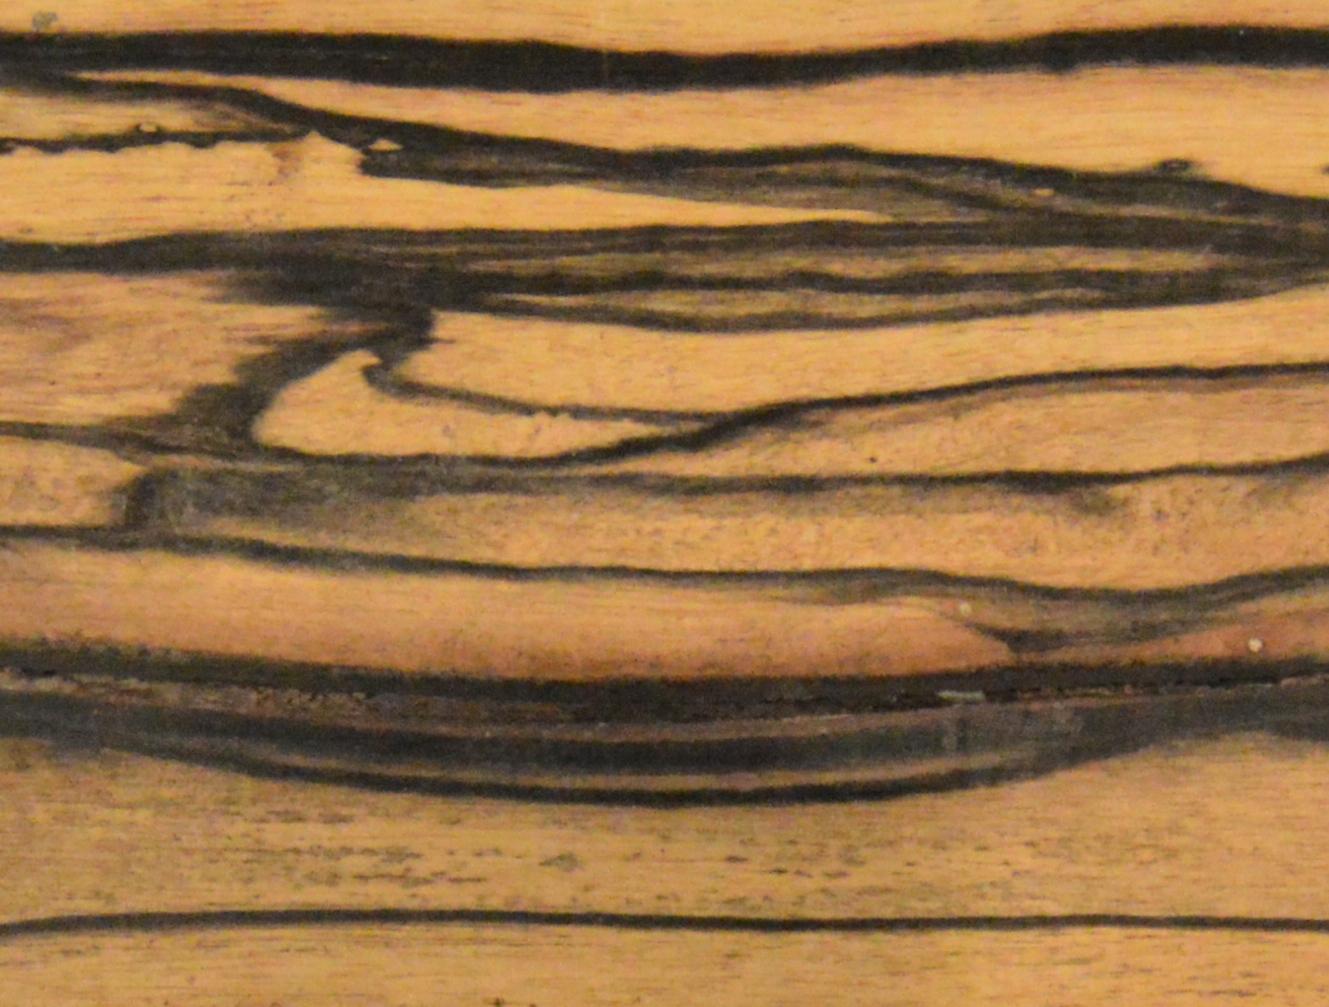 Working with ebony wood